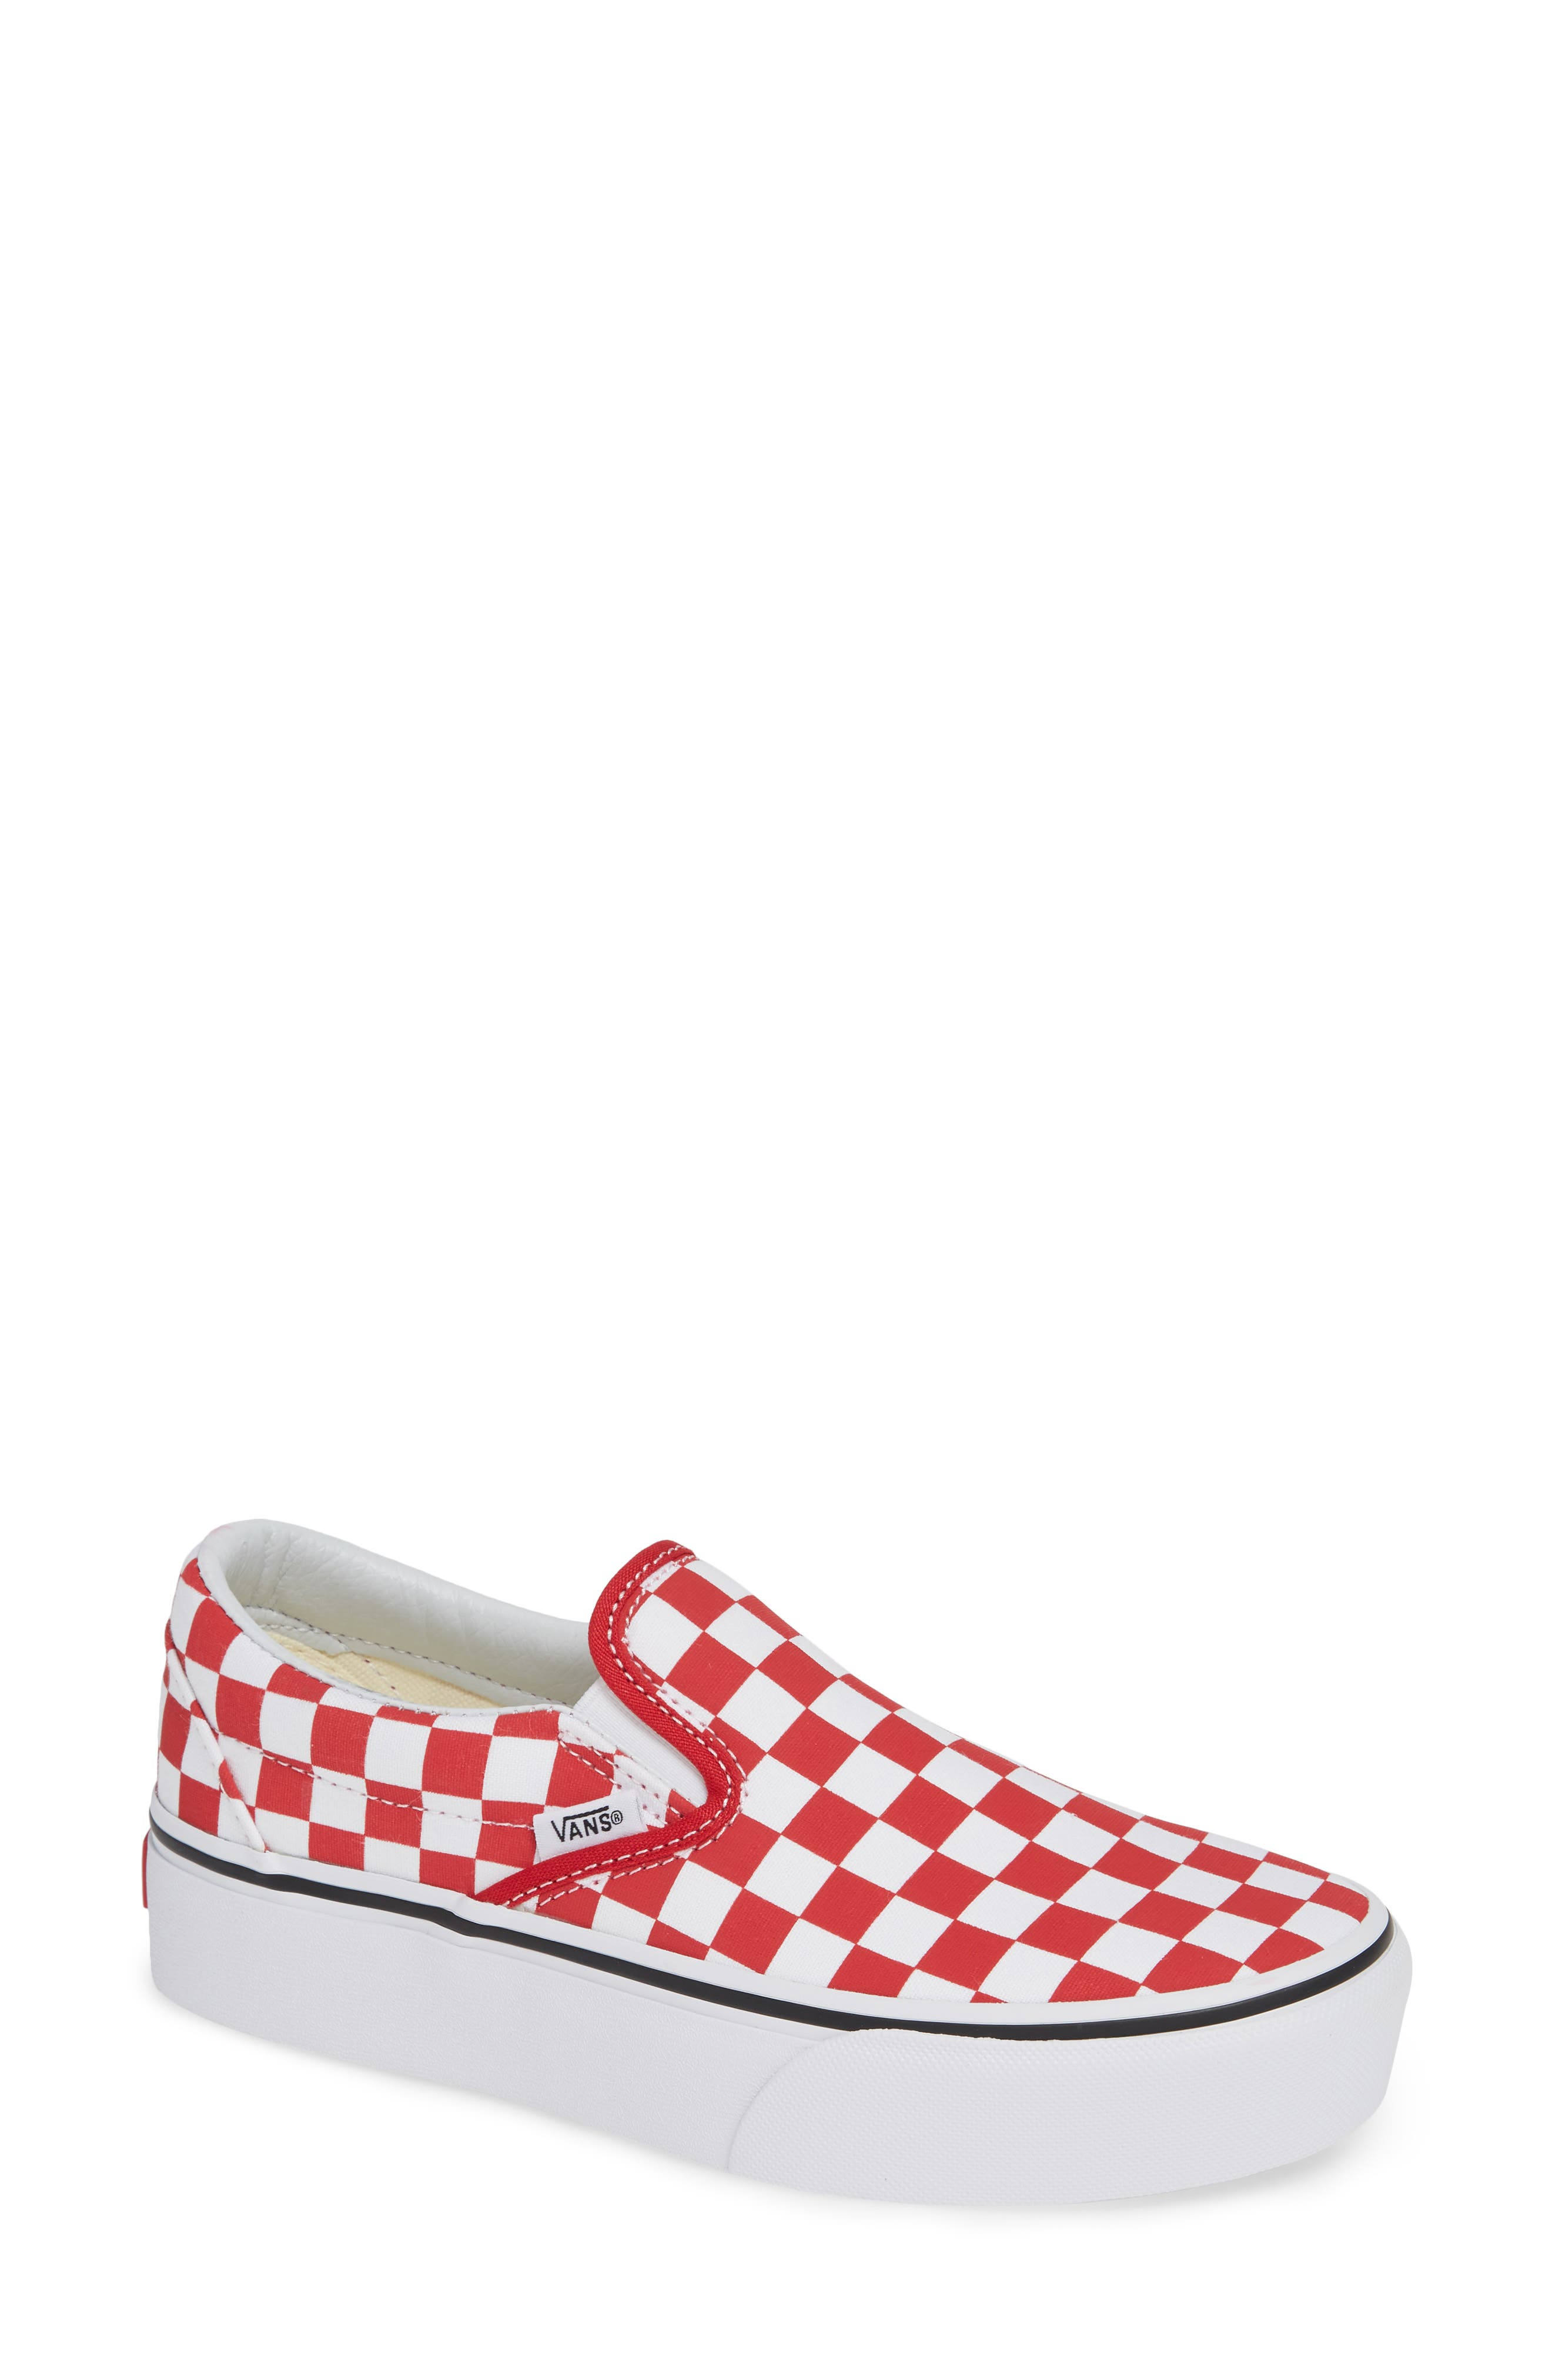 Platform Slip-On Sneaker,                             Main thumbnail 1, color,                             Racing Red/ True White